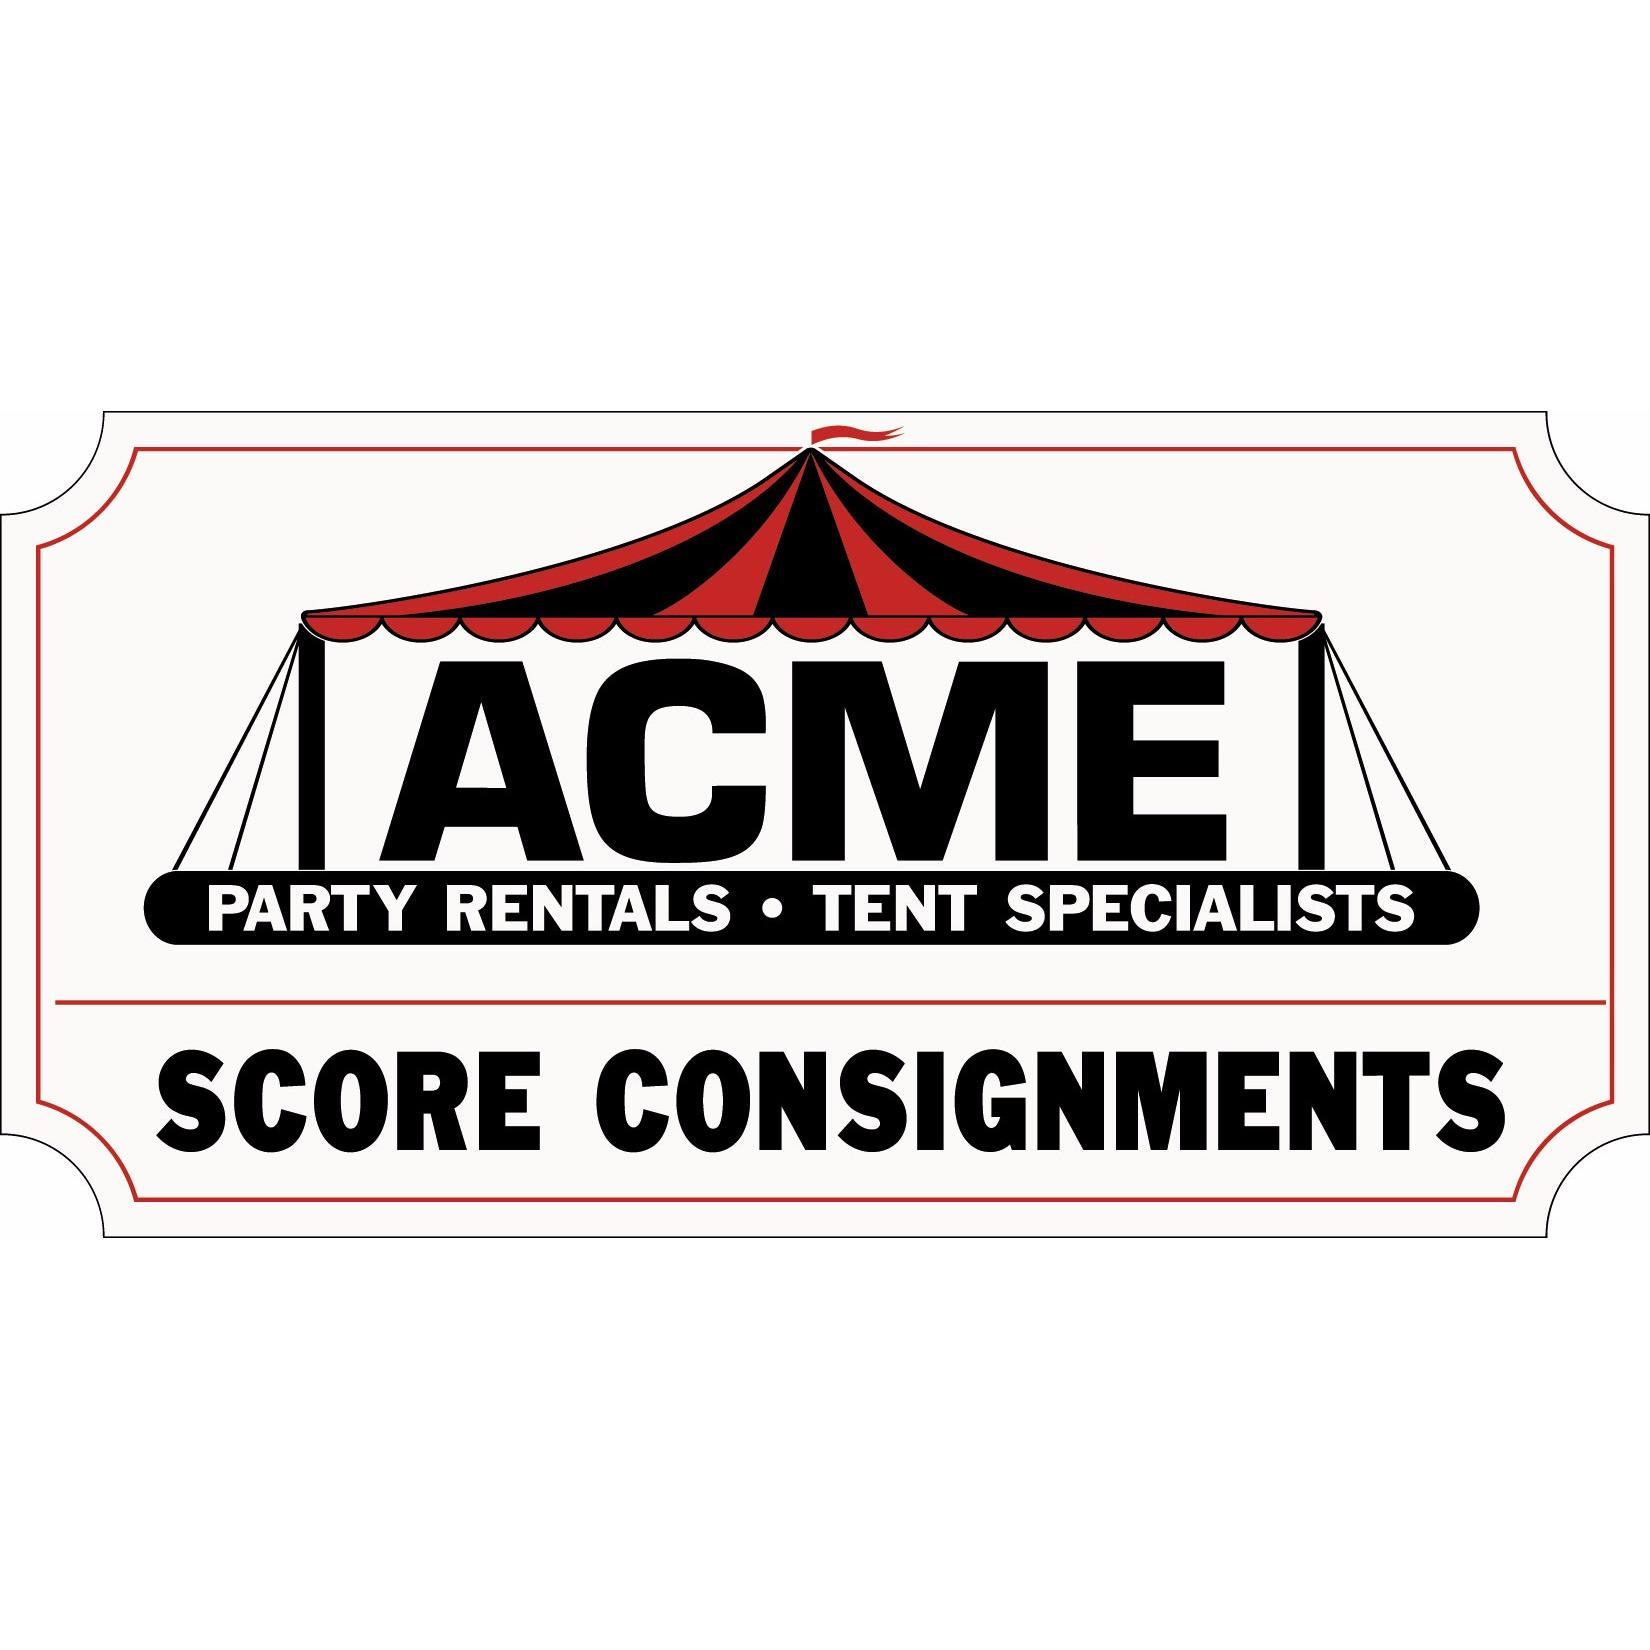 ACME Party Rentals